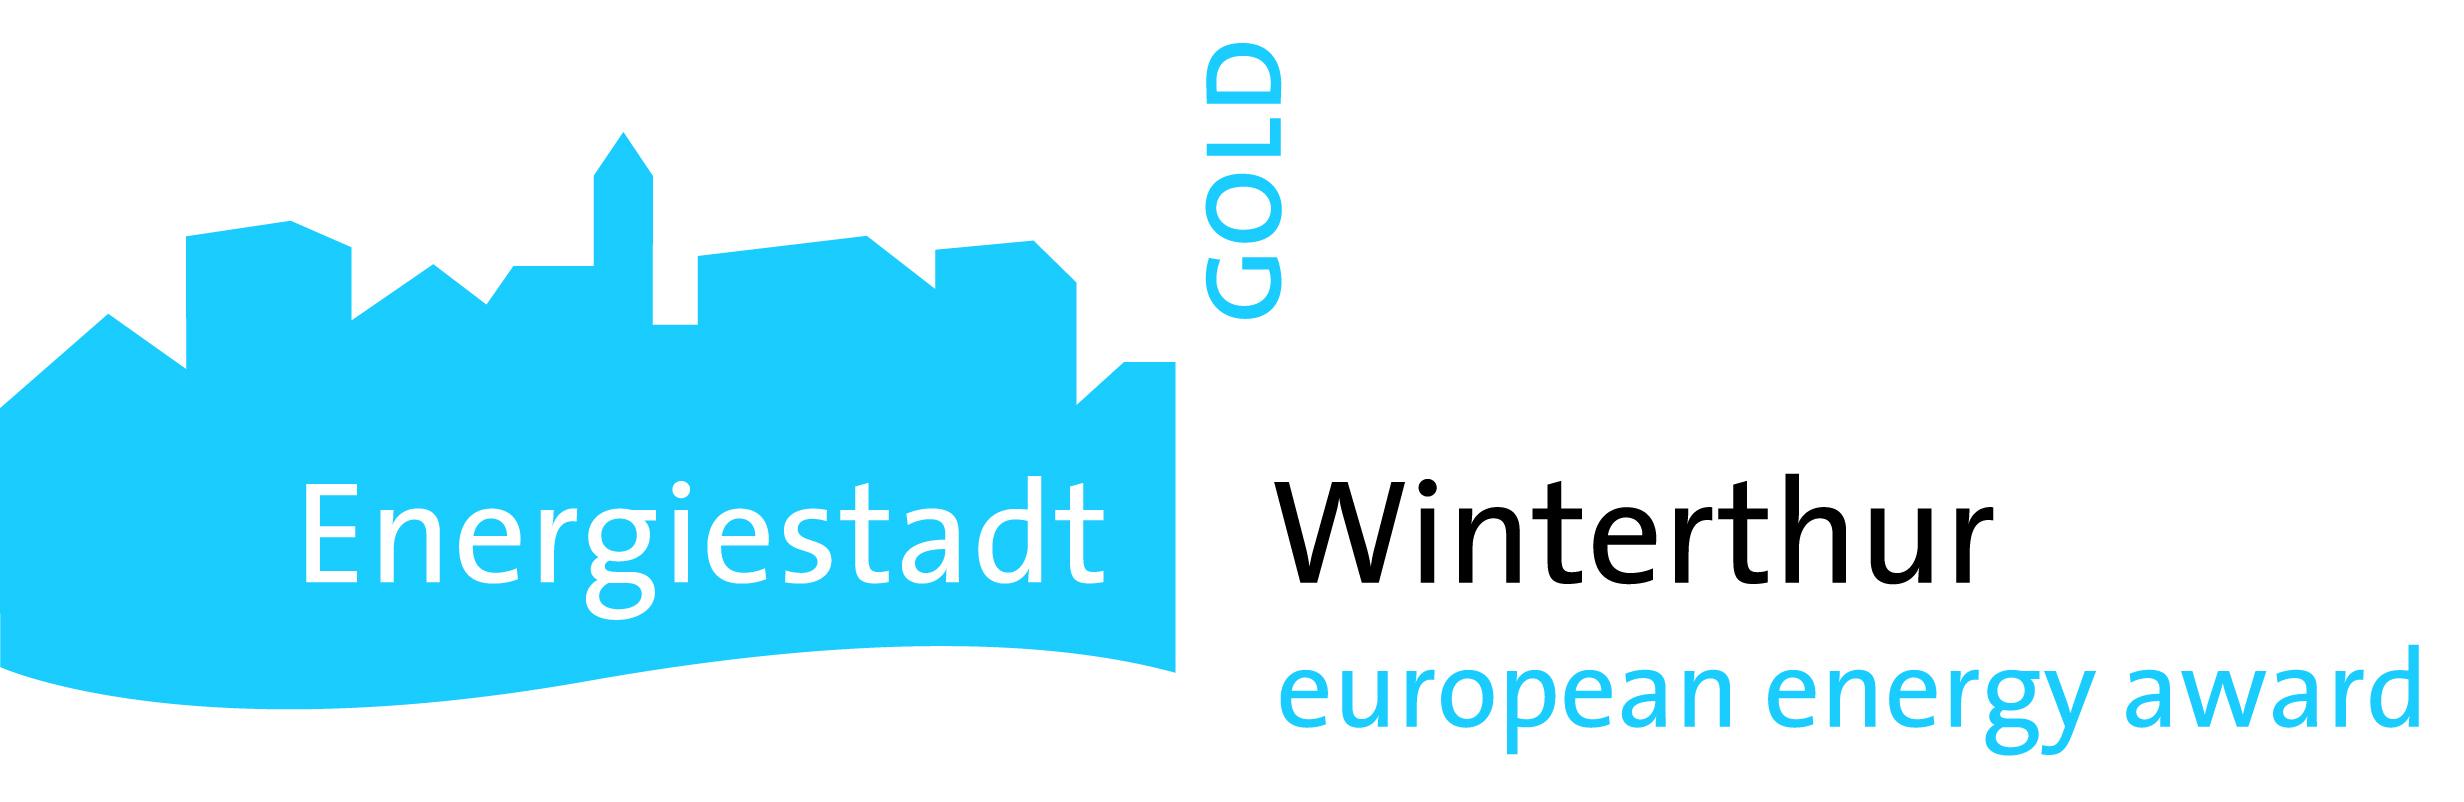 Energiestadt Winterthur Logo